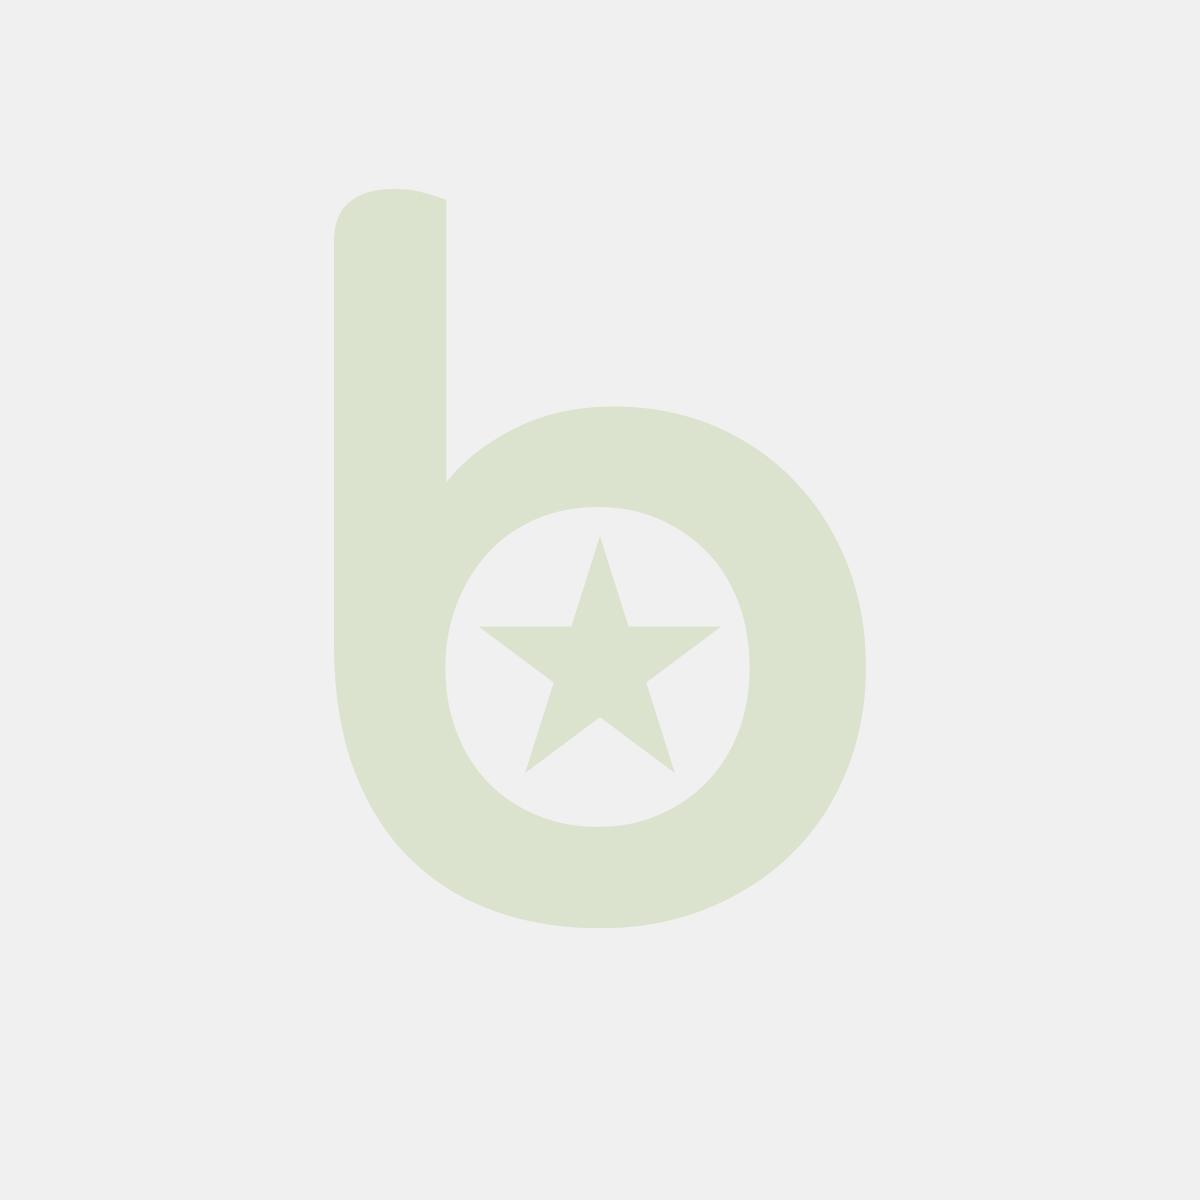 Papier toaletowy JUMBO BaVillo HoReCa+ BIG ROLA celuloza 2 warstwy, opakowanie 12 rolek